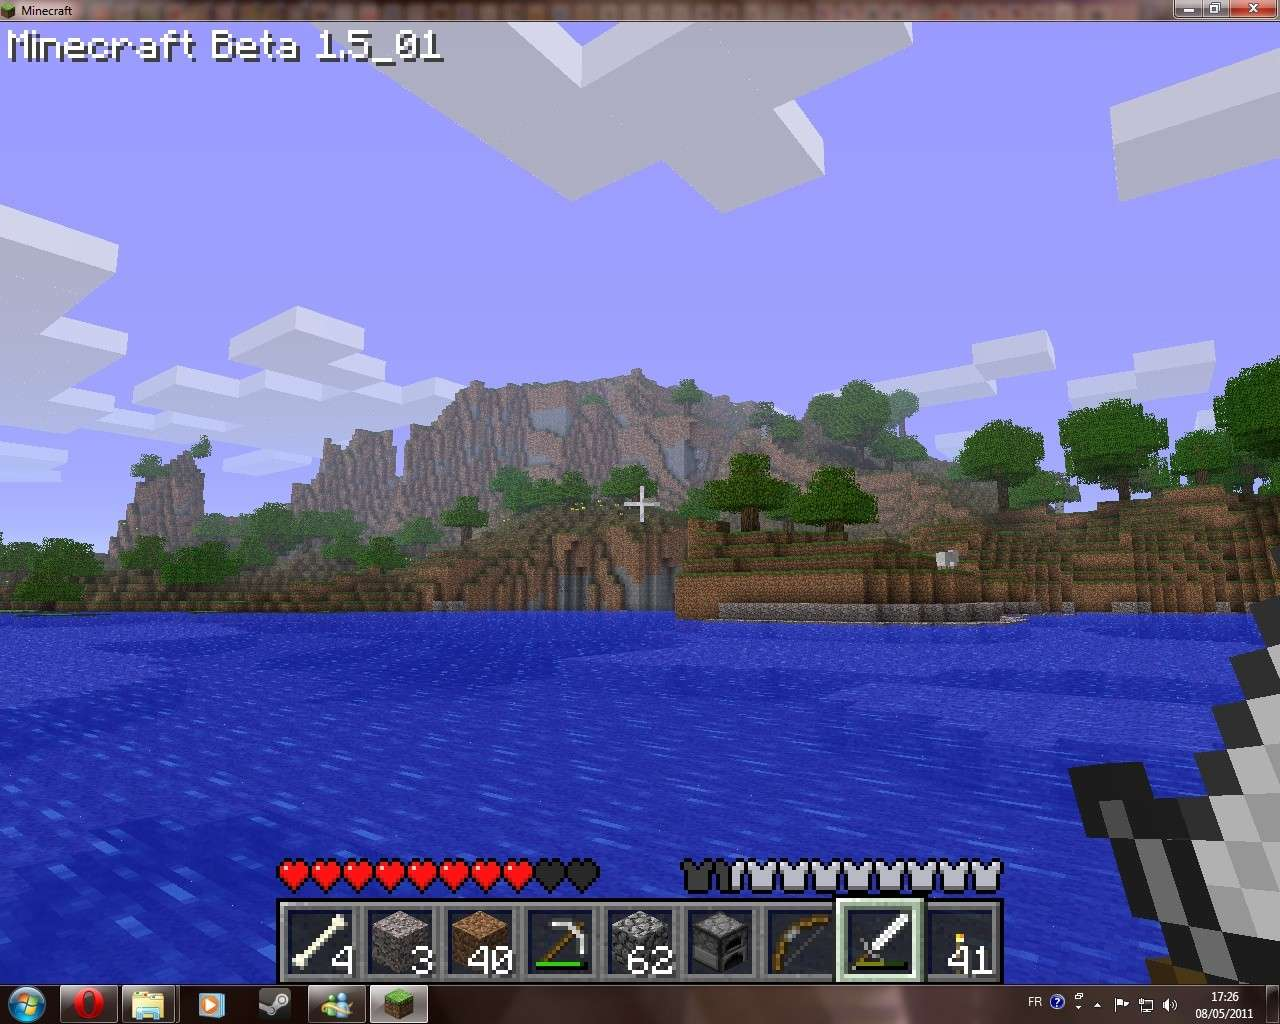 [Minecraft] Mon chez moi (moi moi chez moi moi moiiiii) - Page 6 New_bi22